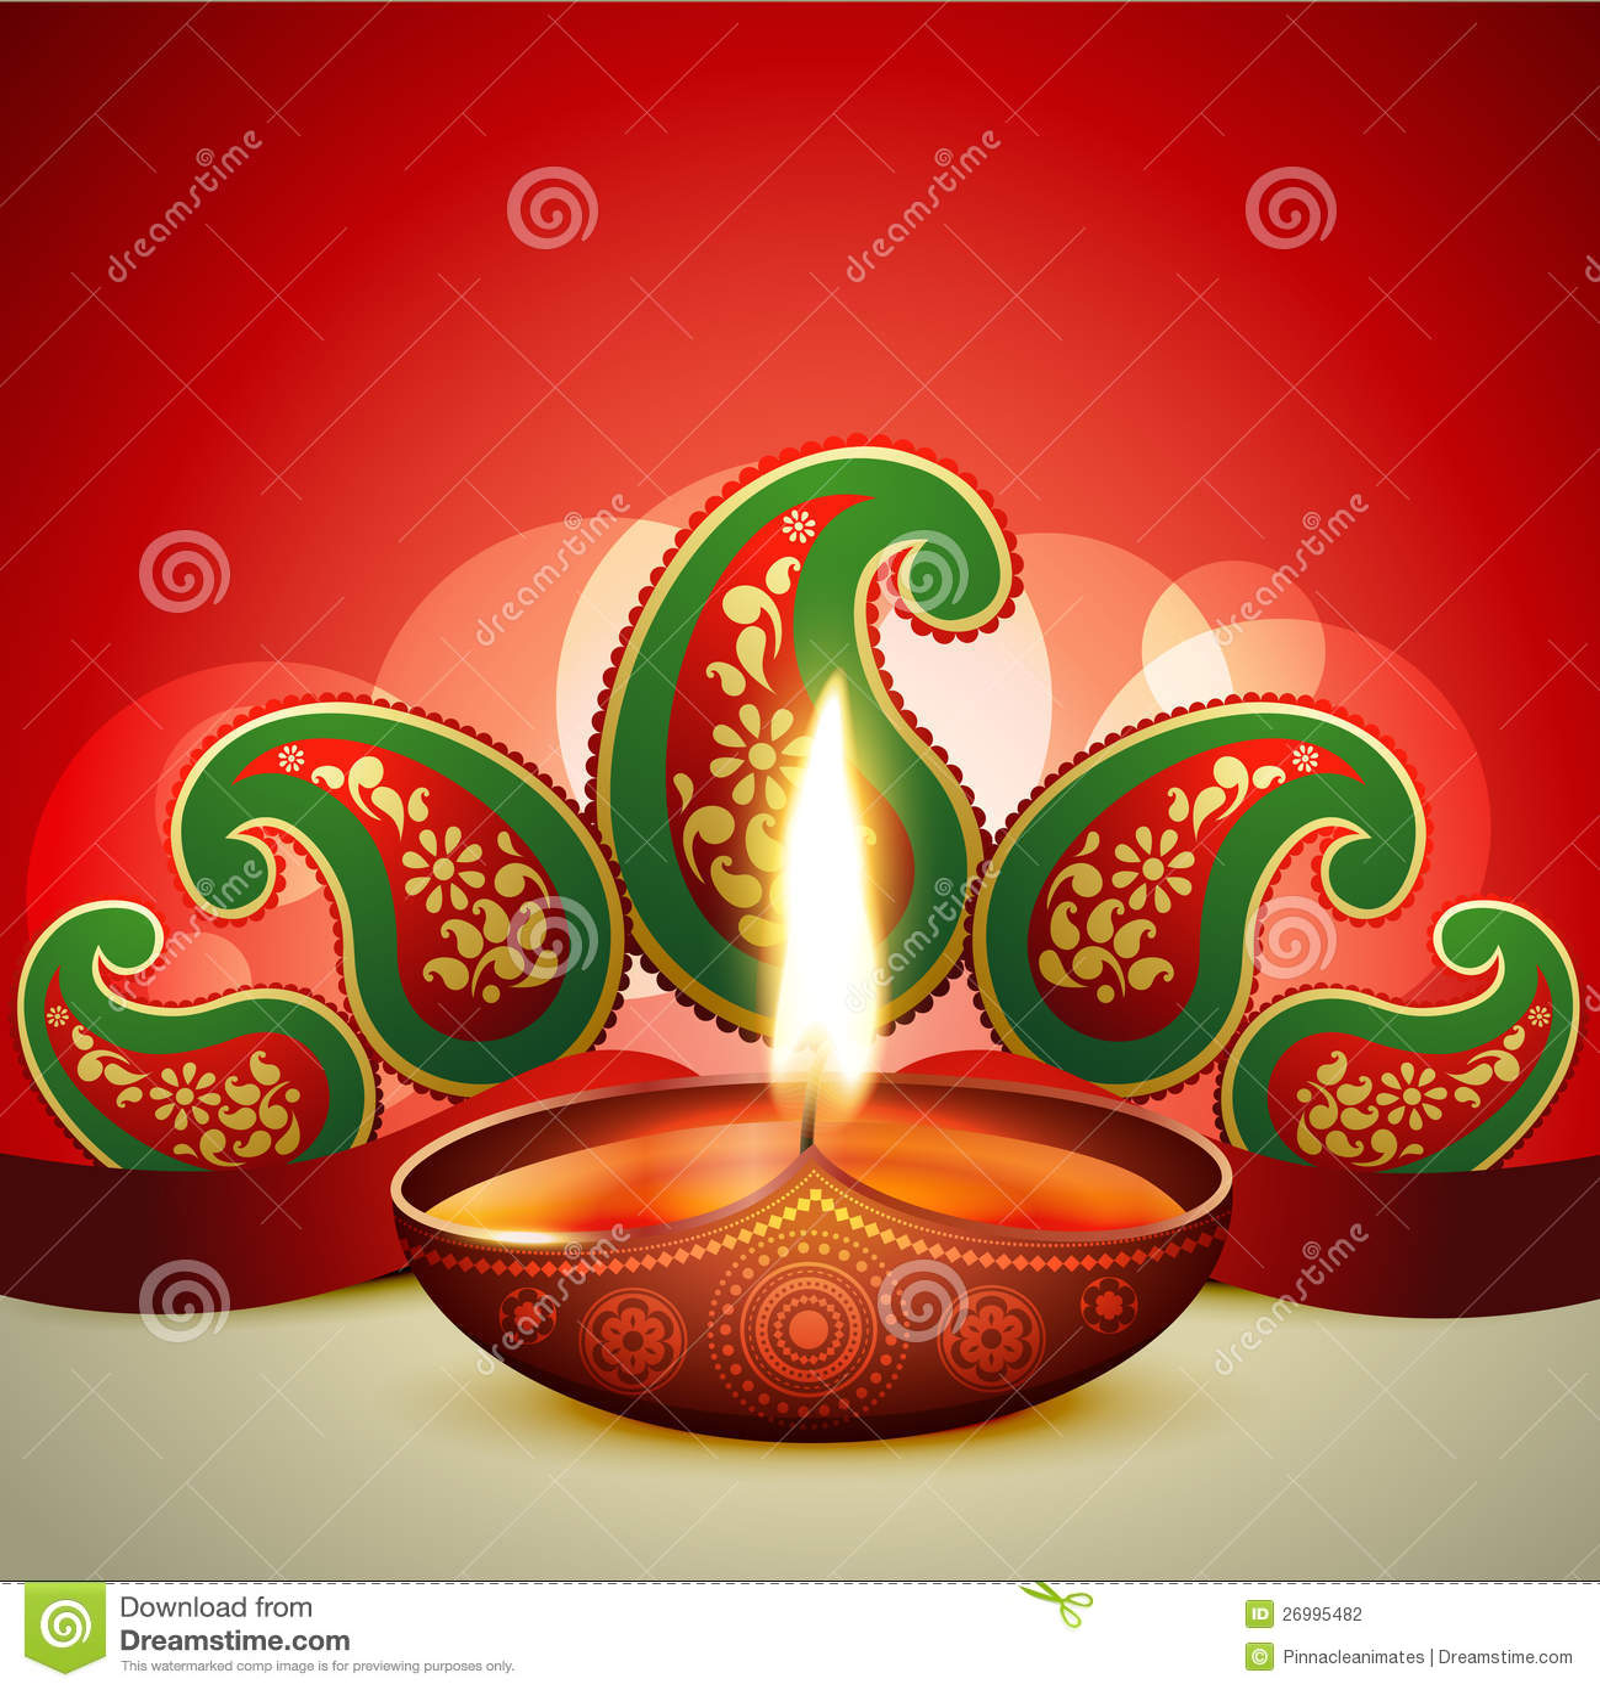 Diwali Diyas Designs Beautiful vector diwali diya